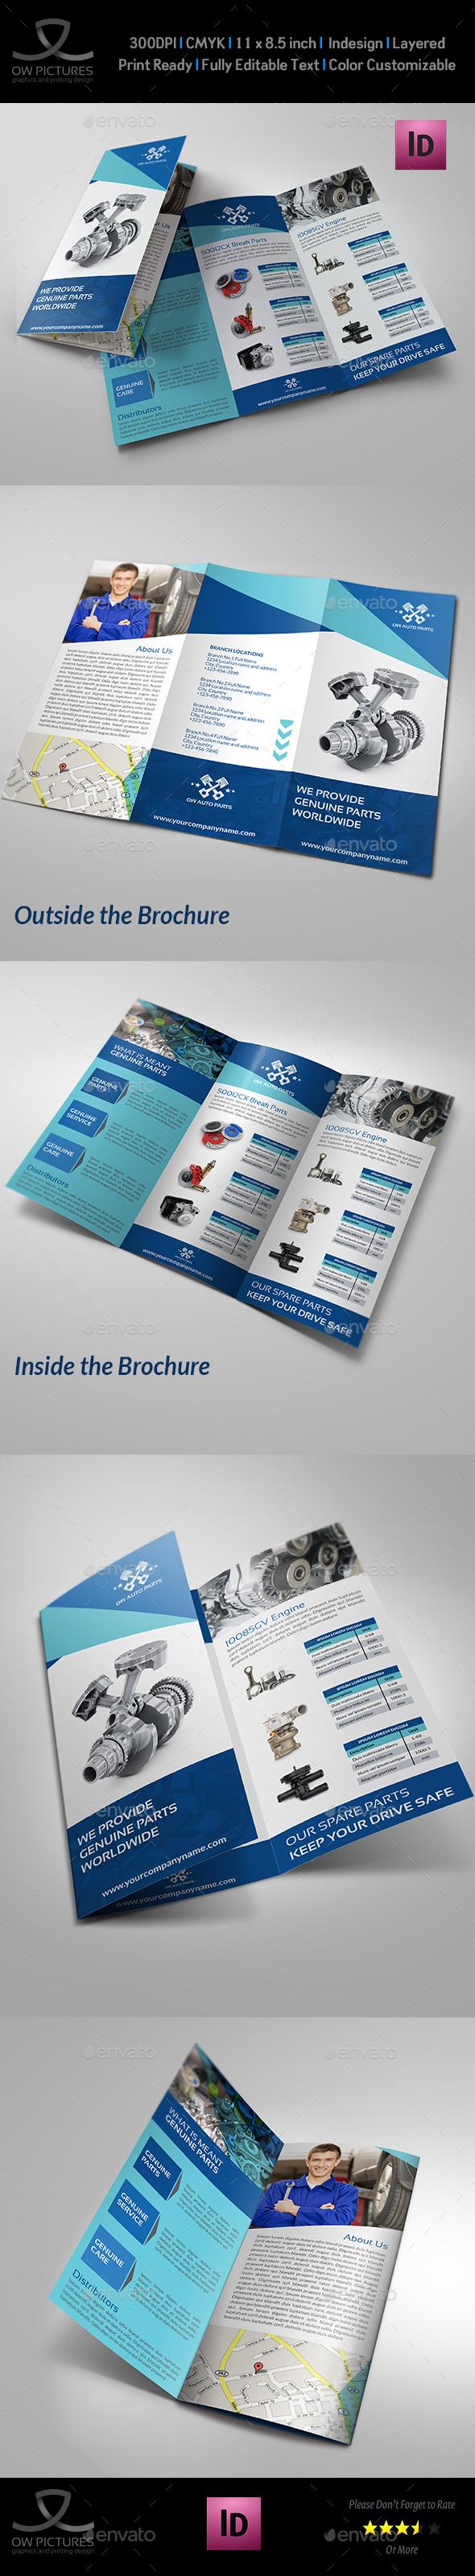 brochure templates envato - auto parts catalog tri fold brochure template by